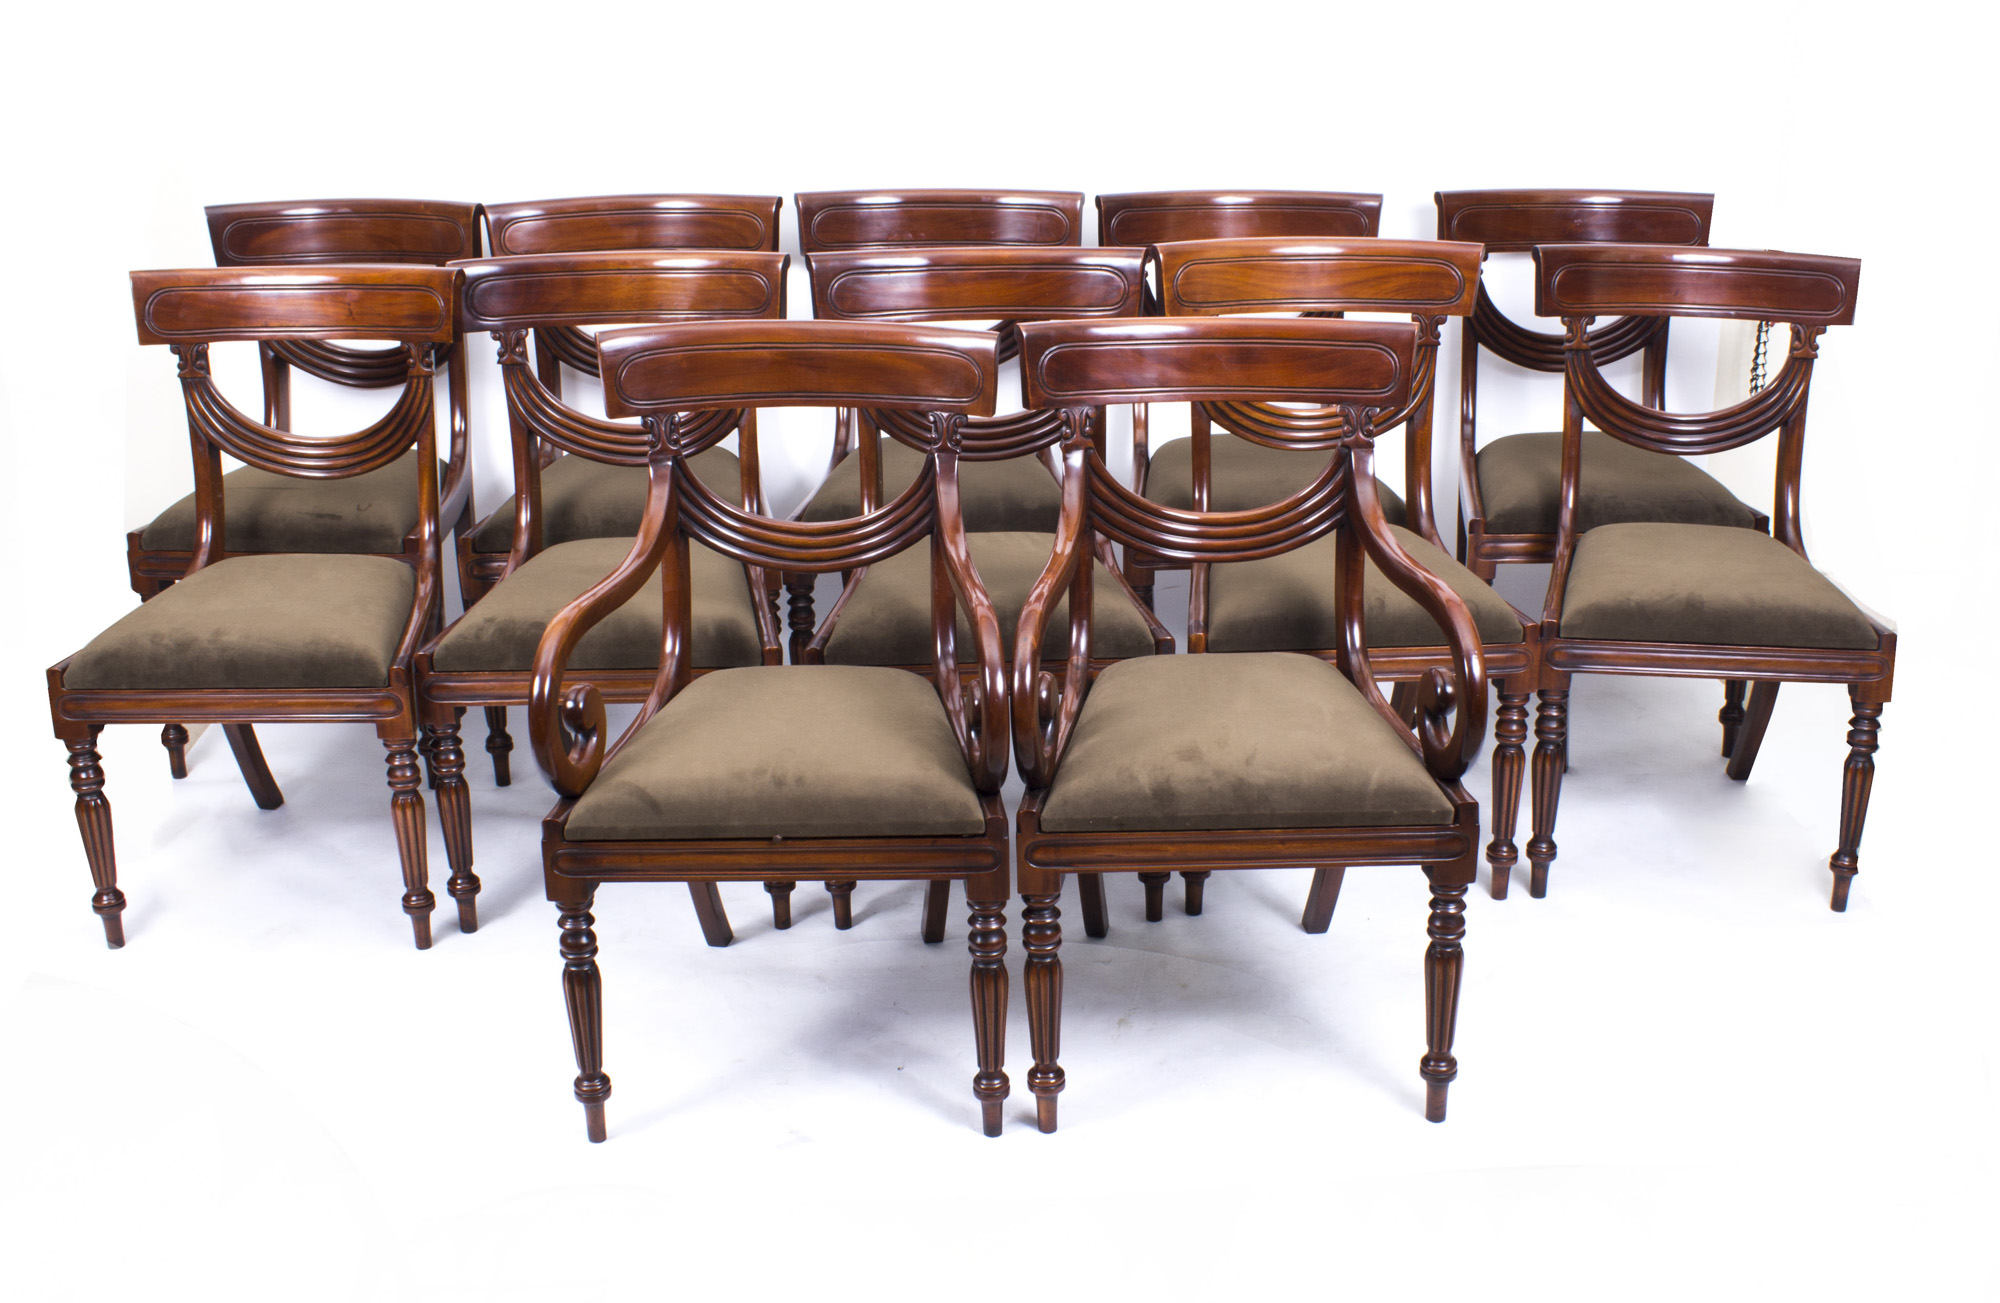 Set regency style mahogany dining chairs